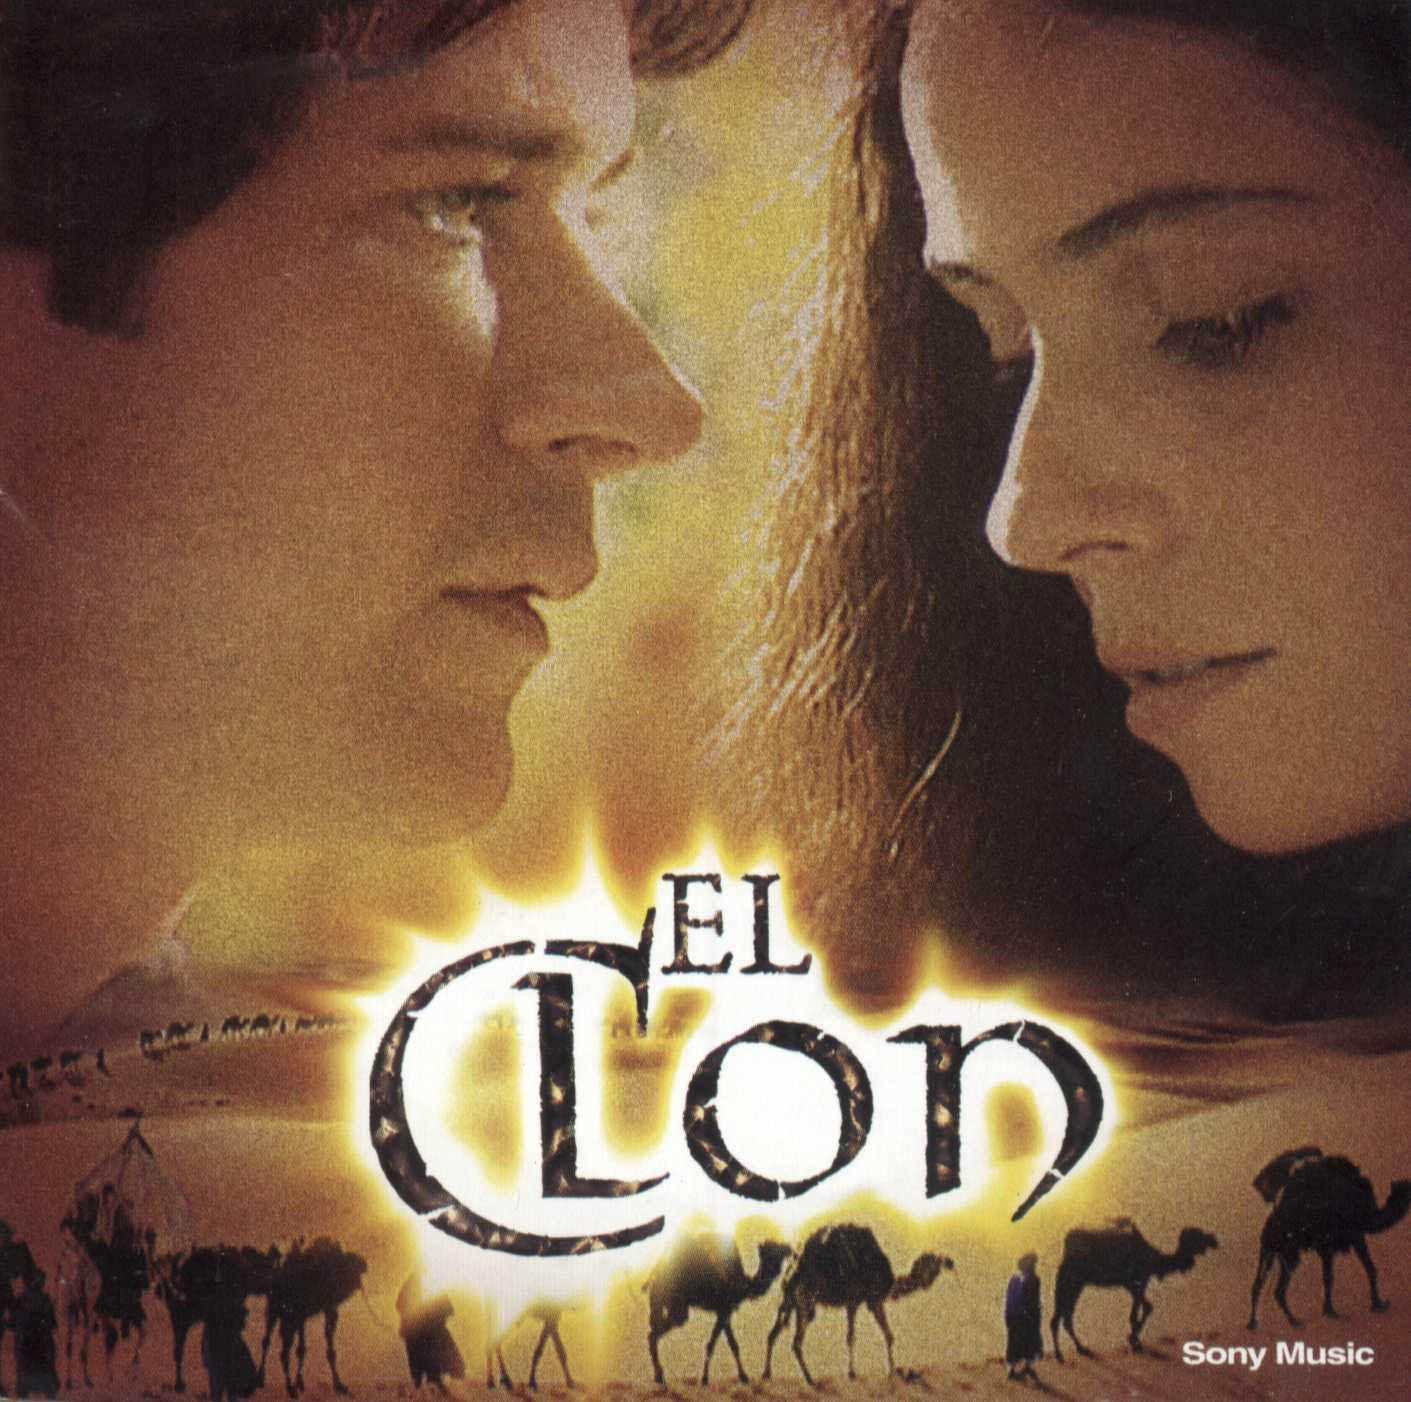 Capitulos El Clon Telenovelas Telemundo